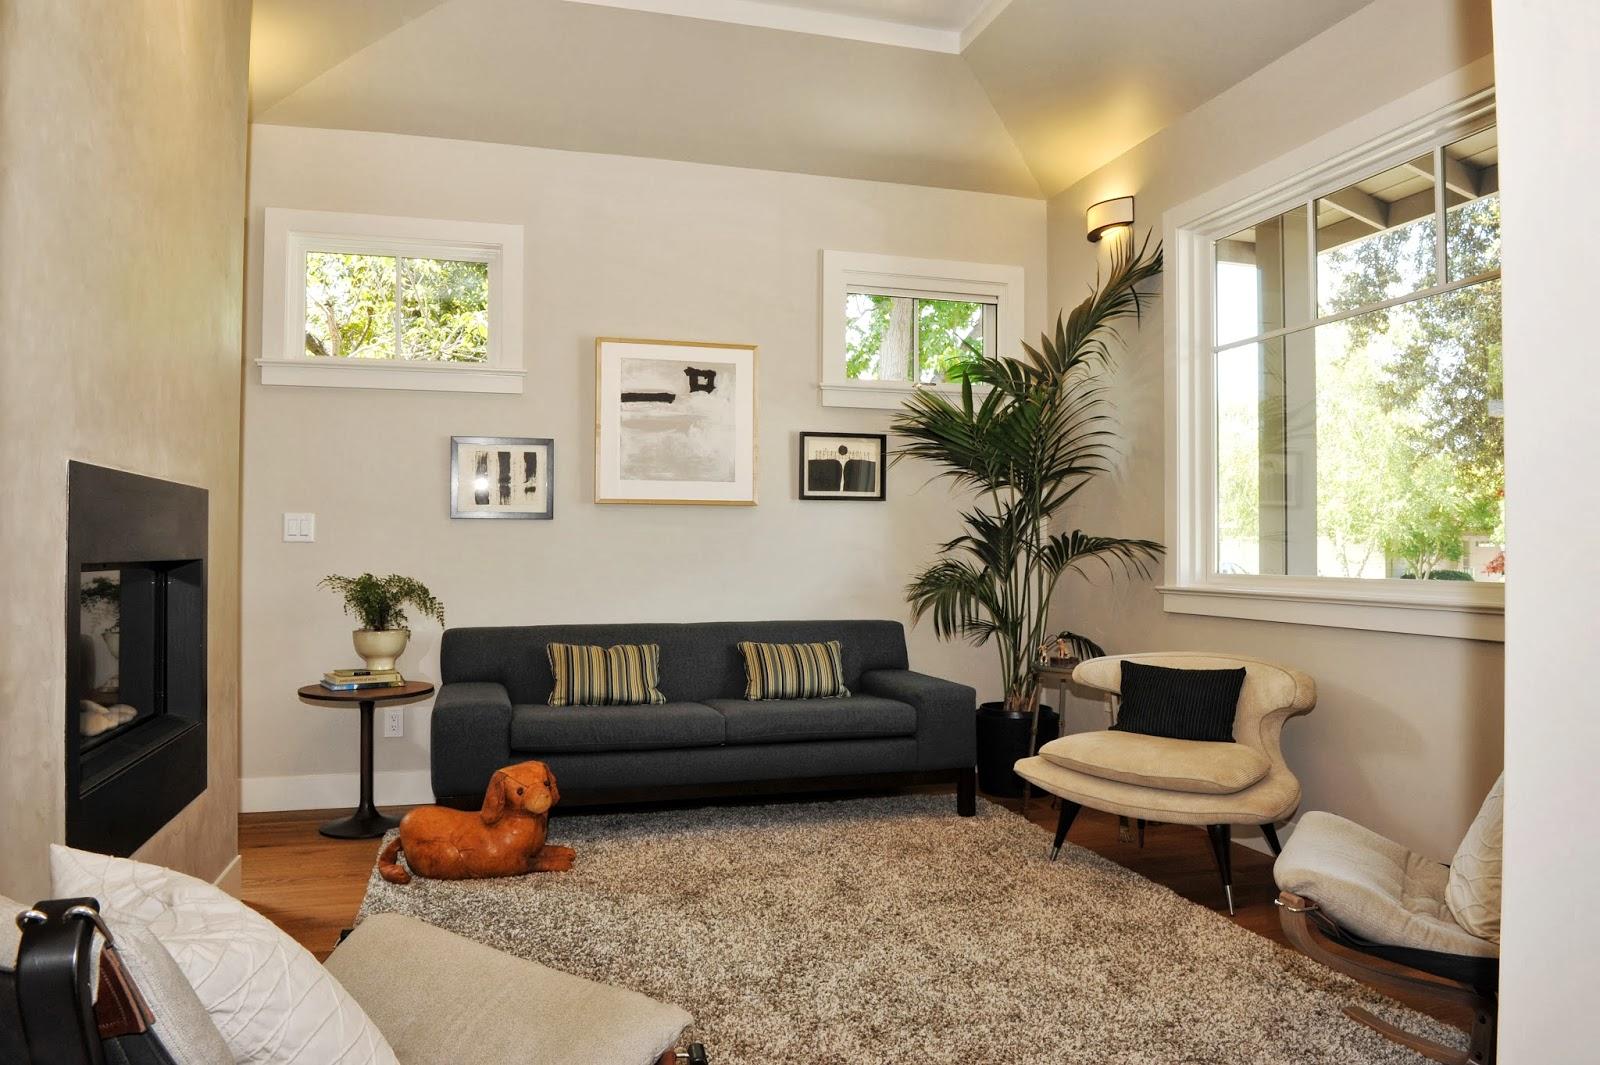 living room 12 x 12 - home decoration ideas